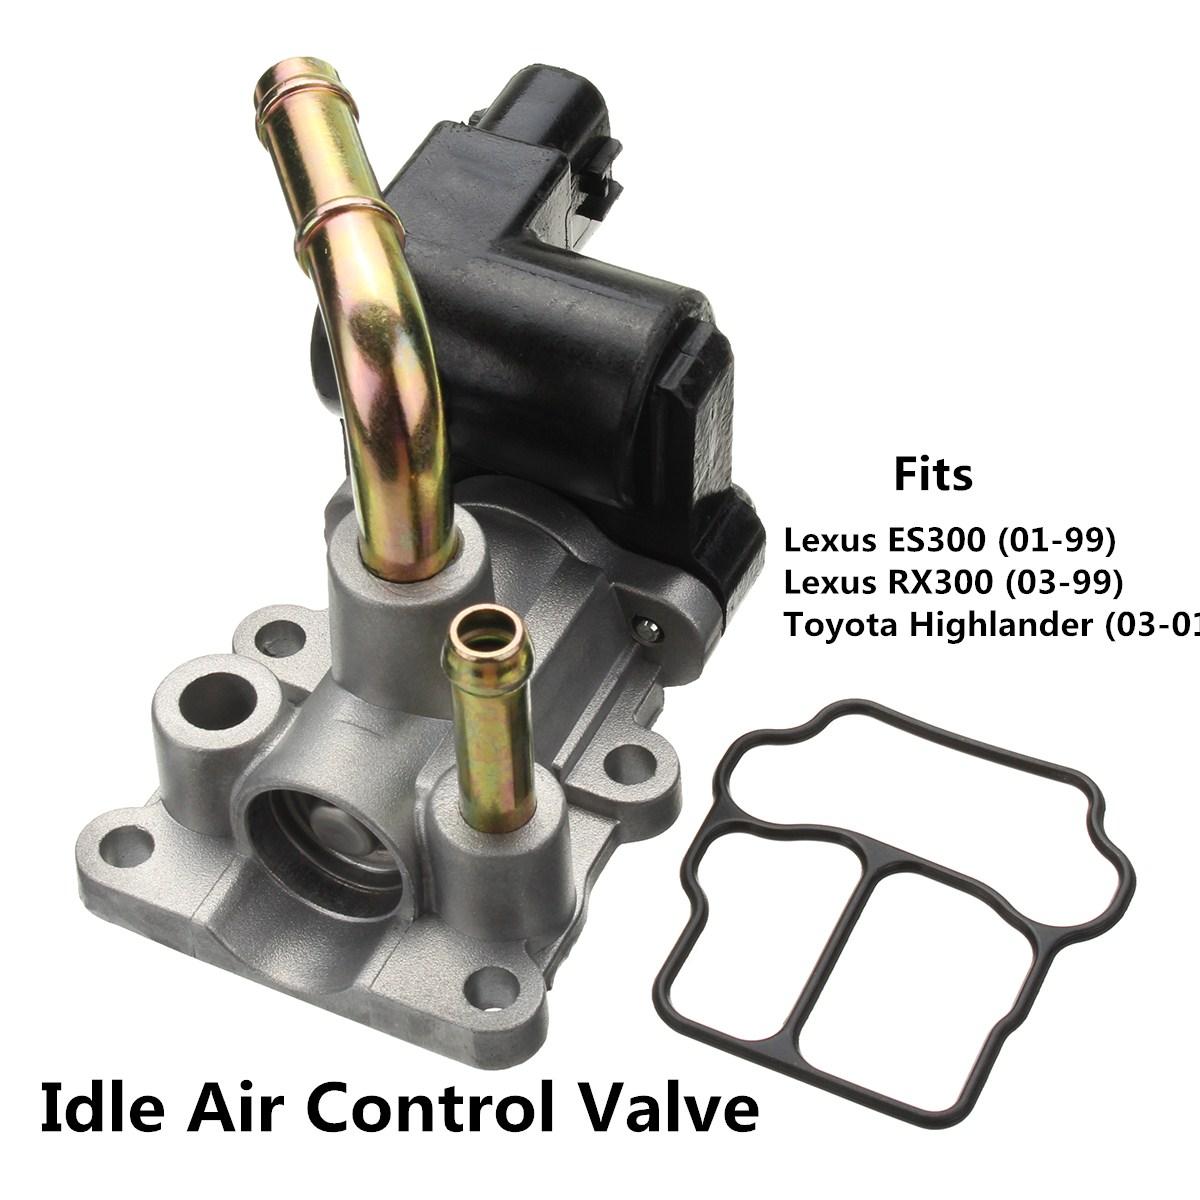 Idle Air Control Valve 2227020050 For Lexus 99-03 ES300 RX300 For Toyota Highlander